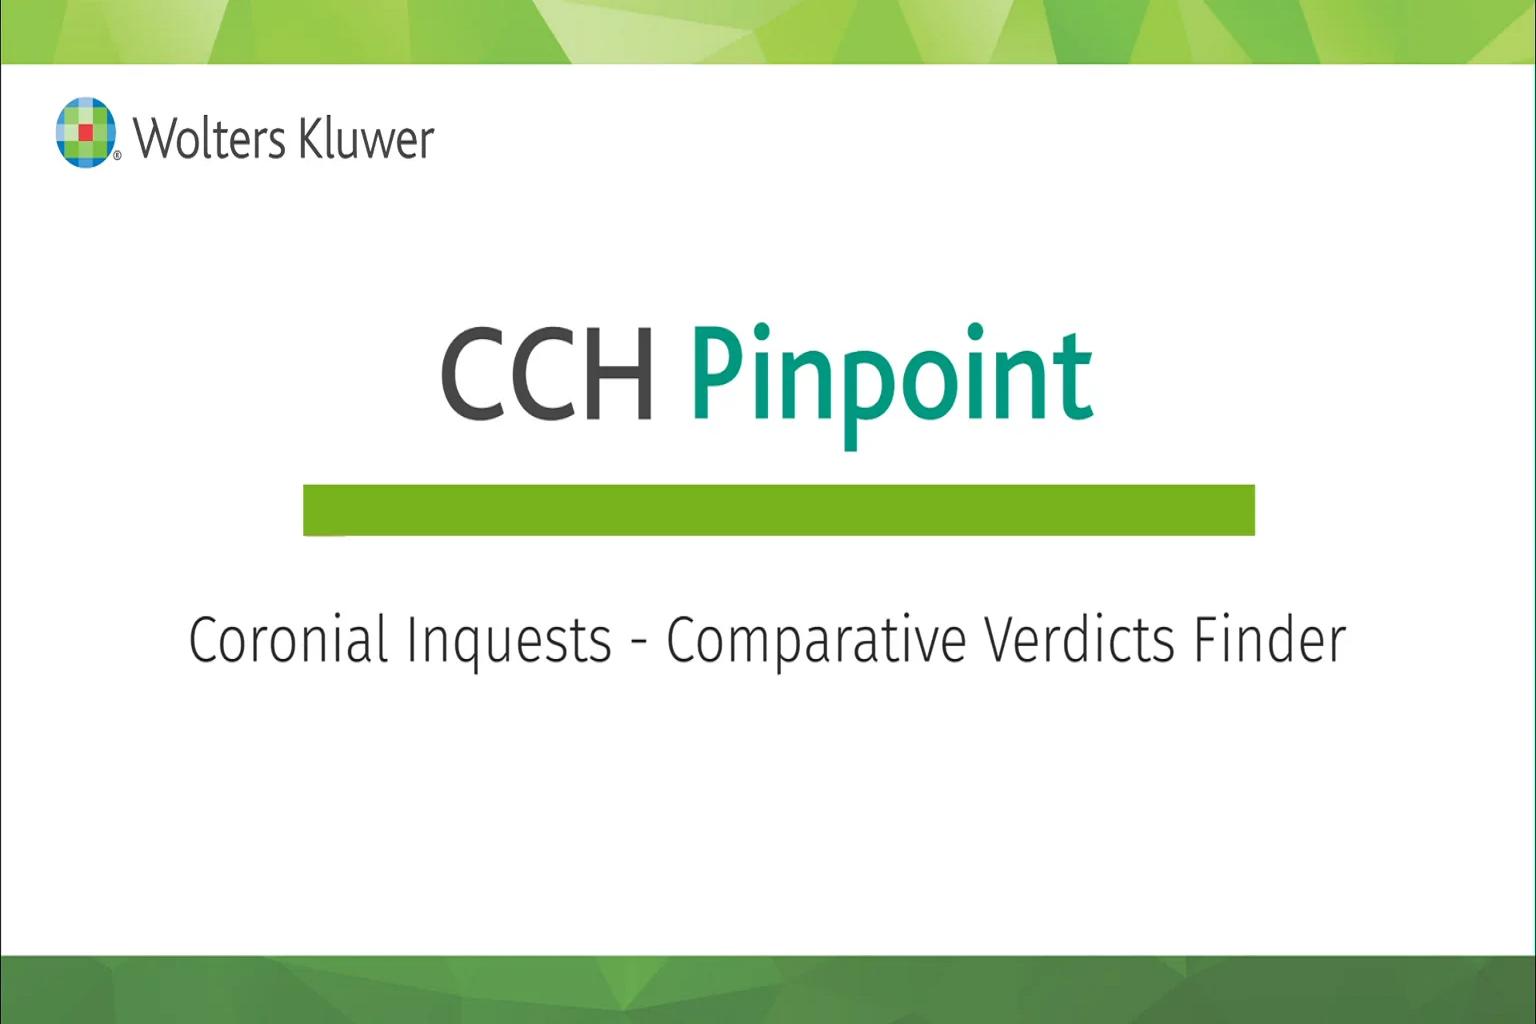 Coronial inquests